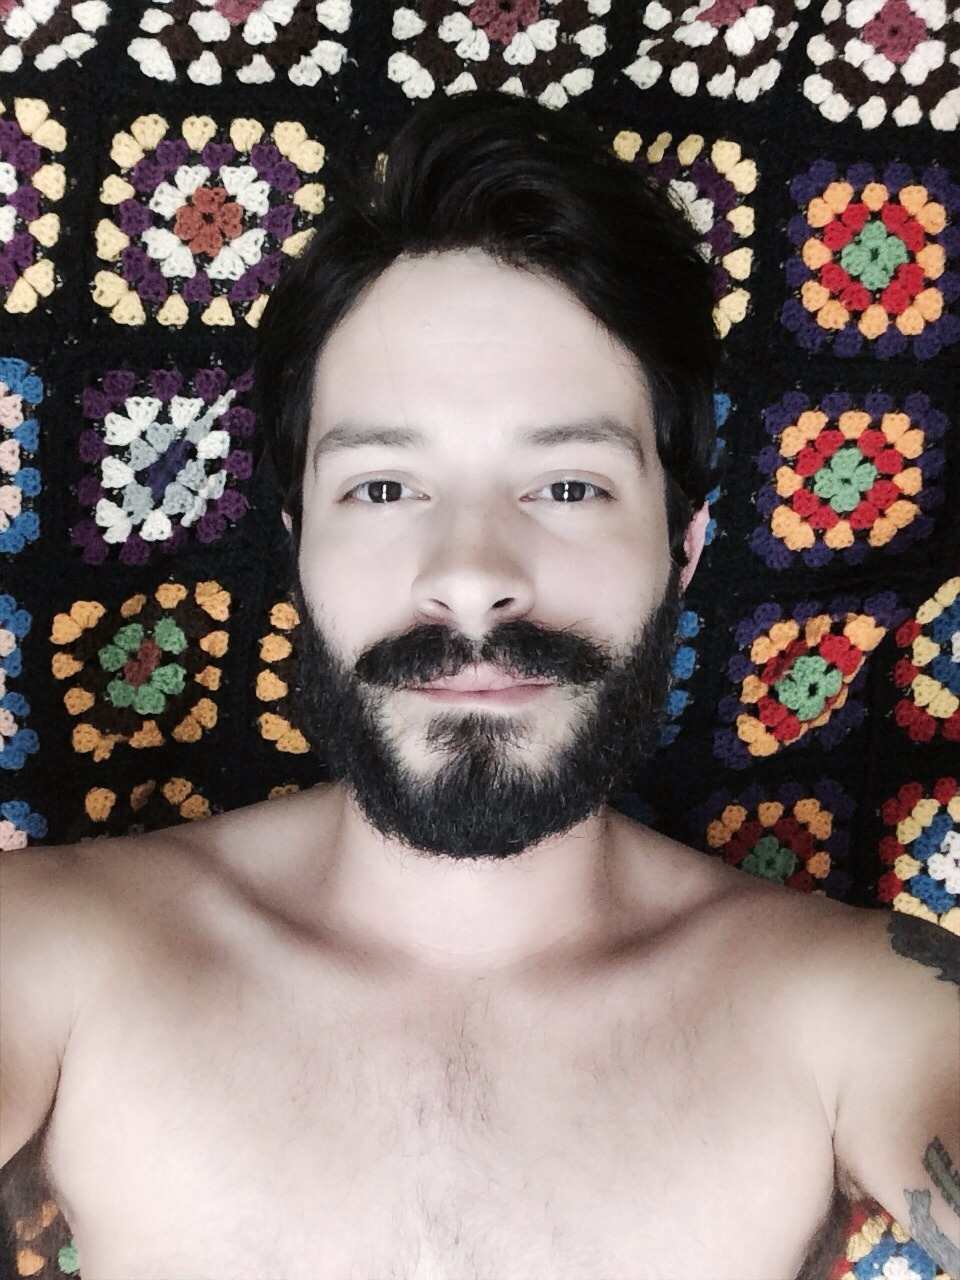 2018-06-04 05:22:39 - dontbehastie stretching beardburnme http://www.neofic.com